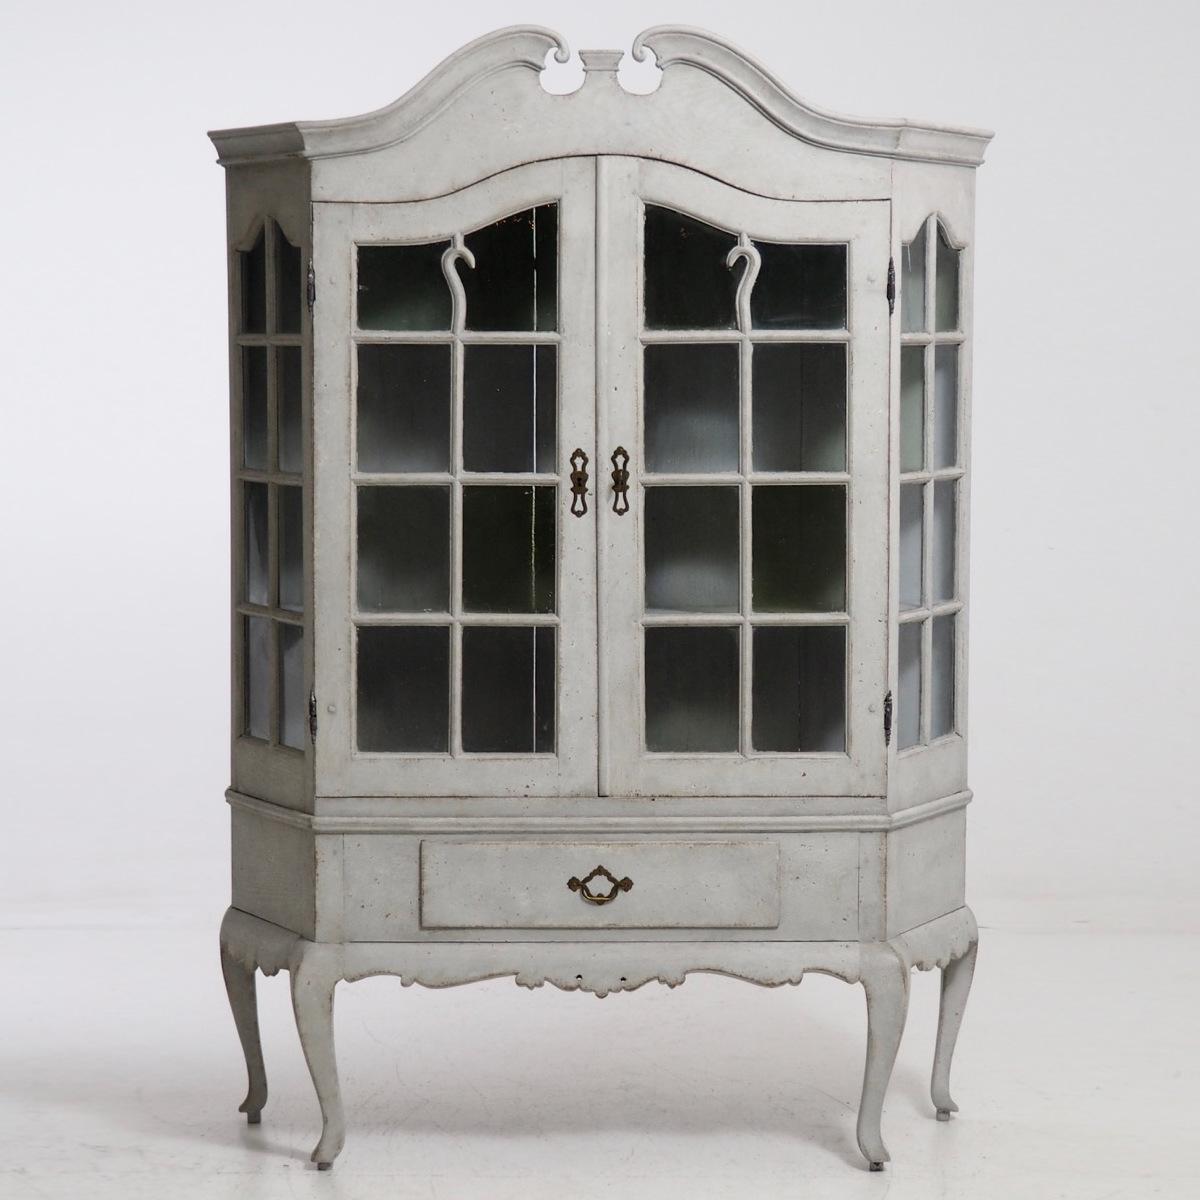 Cabinetw.glass0_srcset-large.jpg